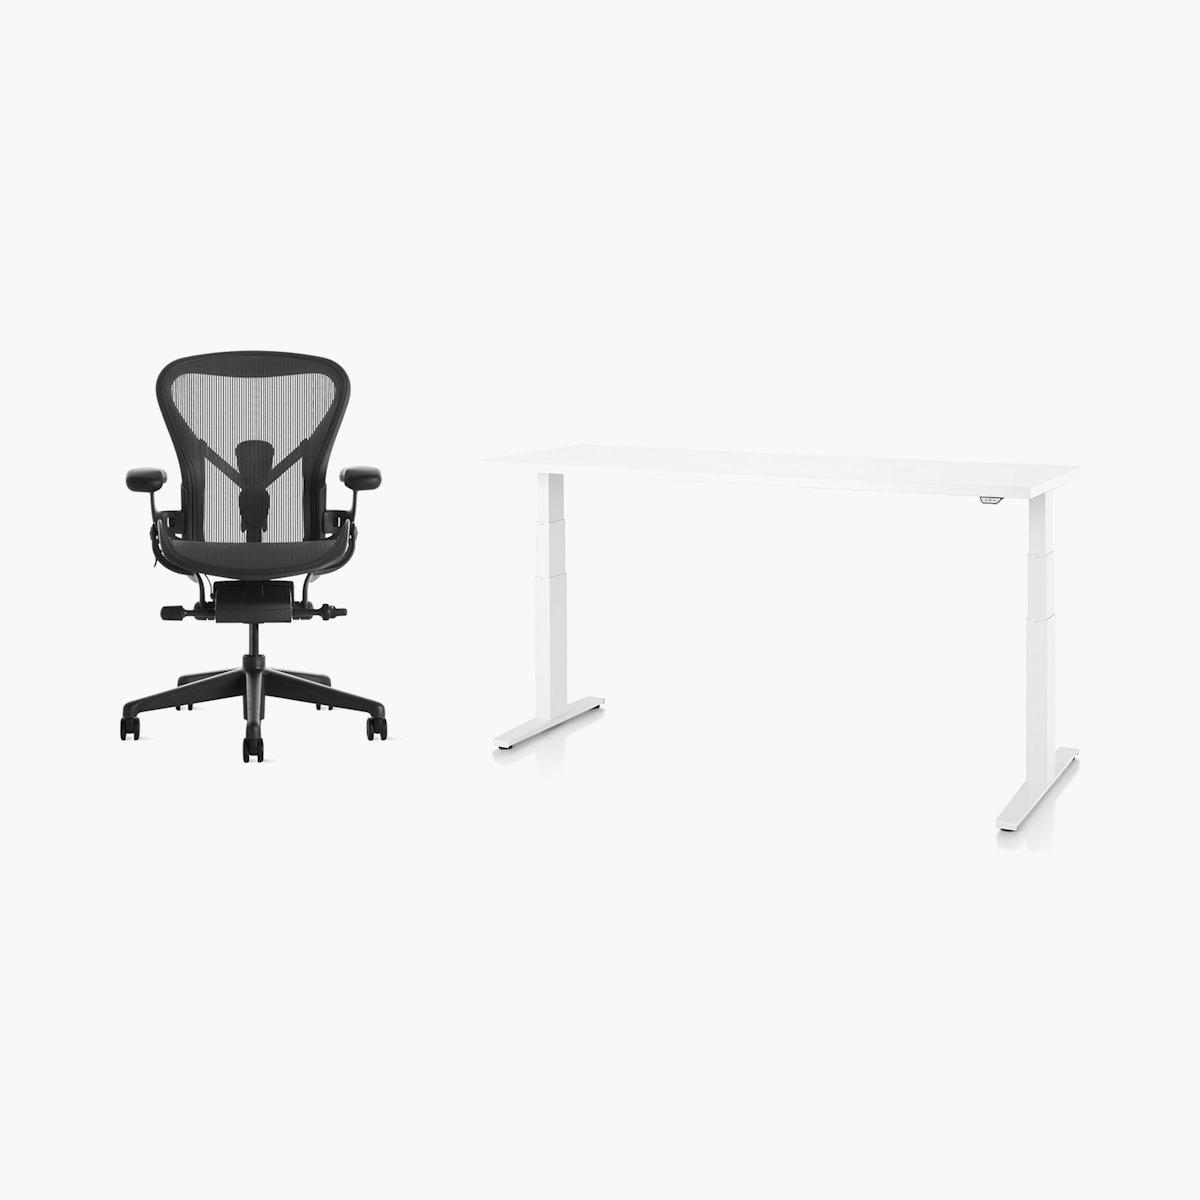 Aeron Chair / Motia Desk Office Bundle